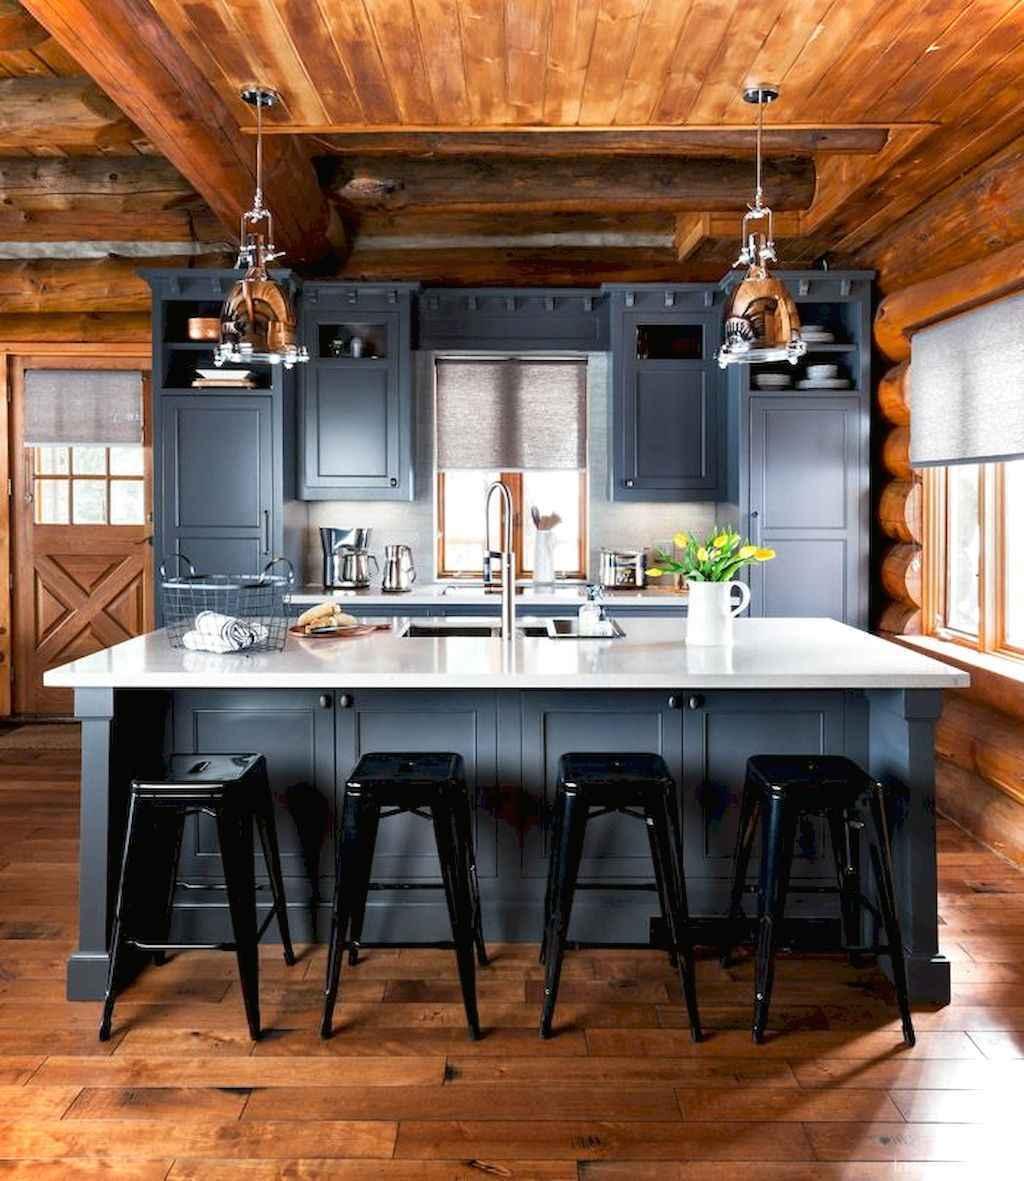 Amazing cottage kitchen cabinets ideas036